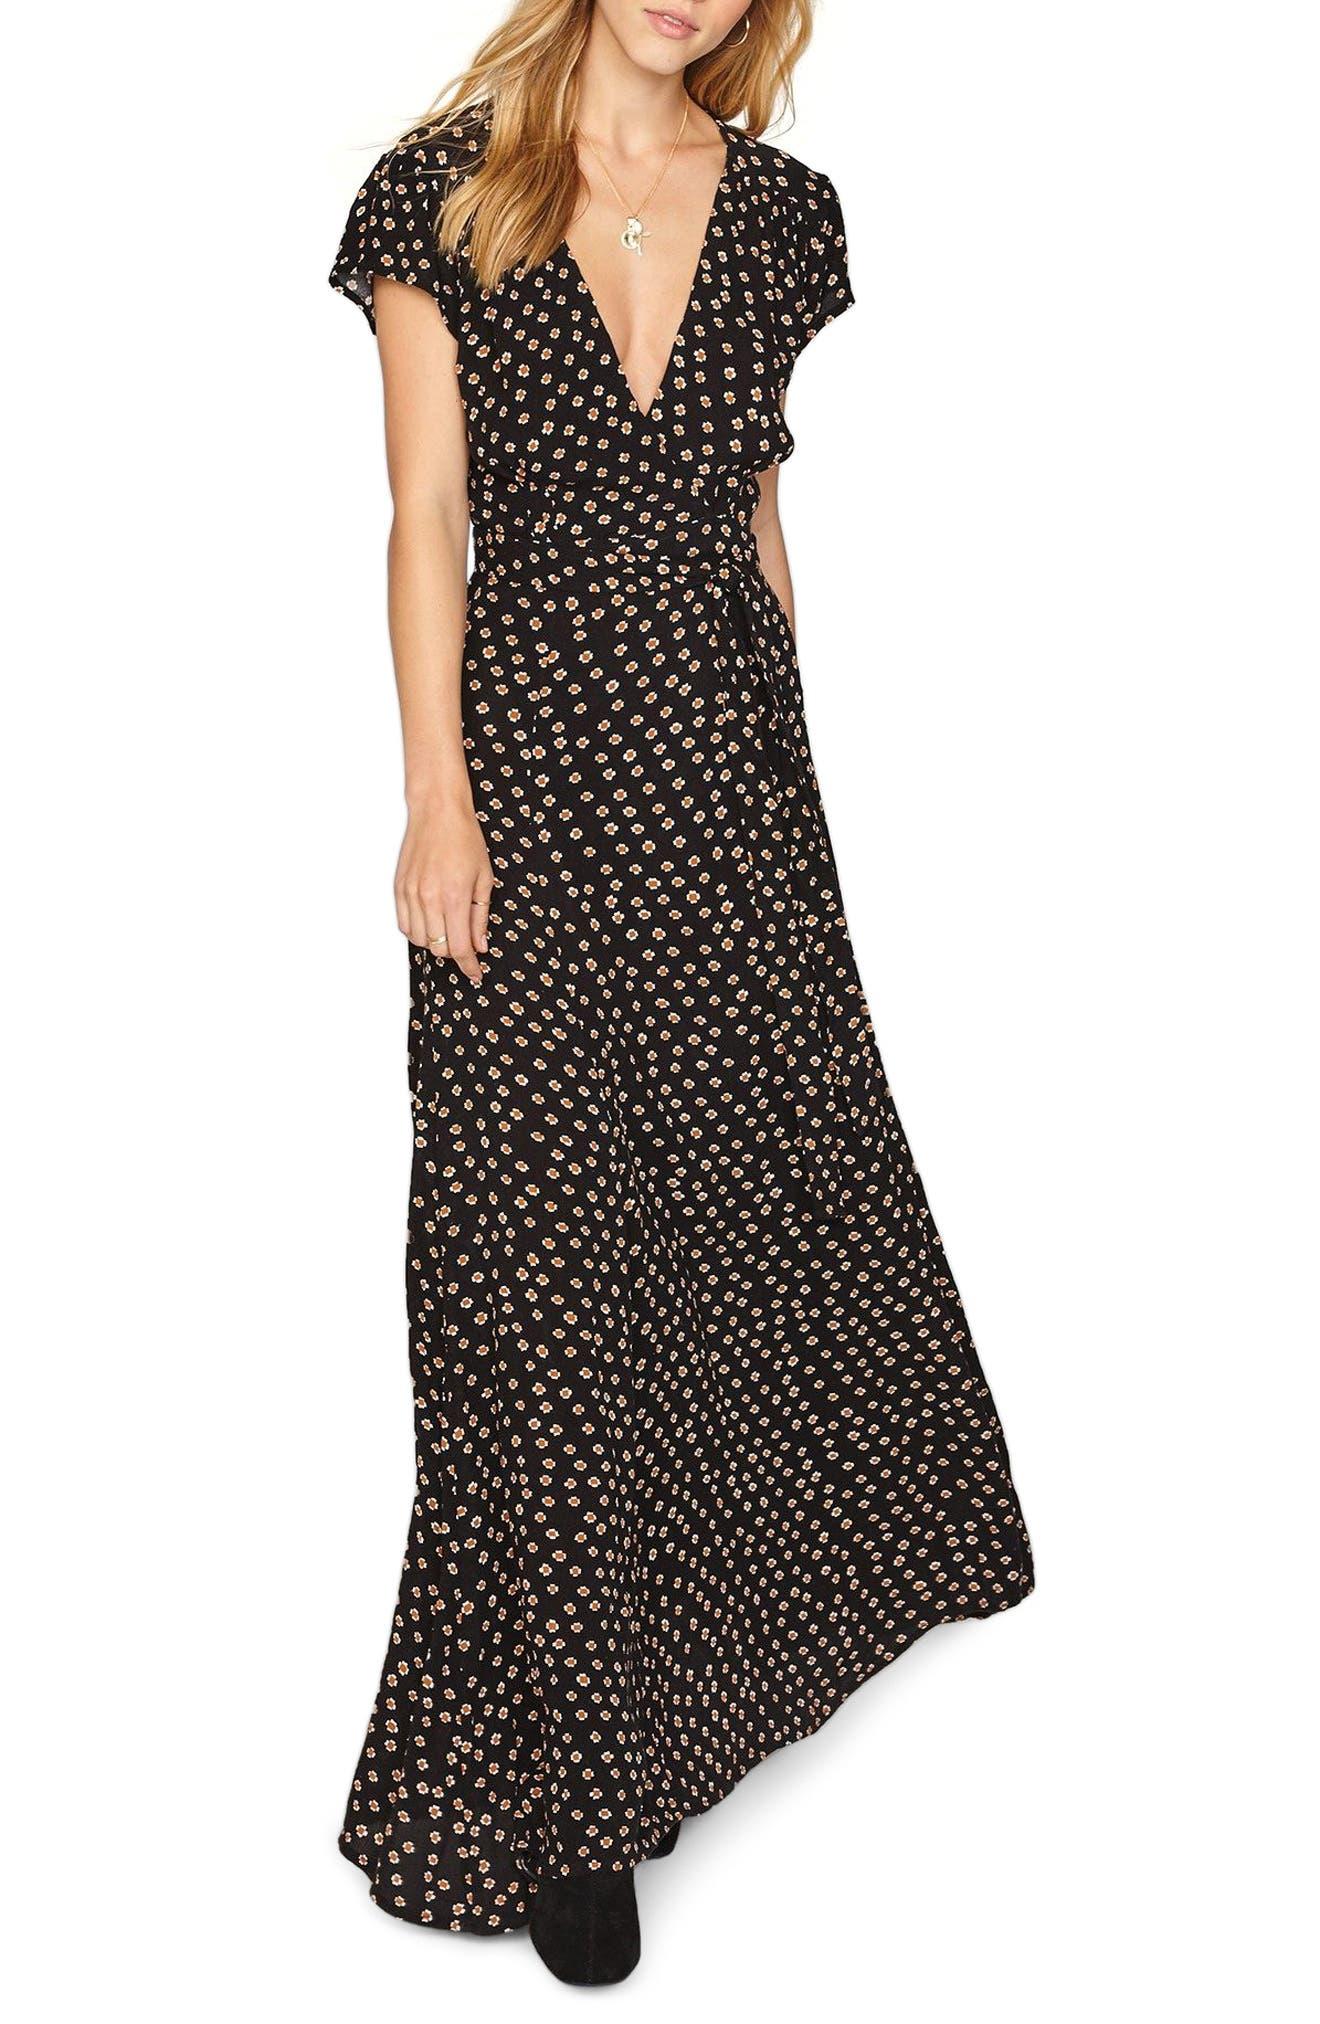 Beachscape Maxi Wrap Dress,                             Main thumbnail 1, color,                             001